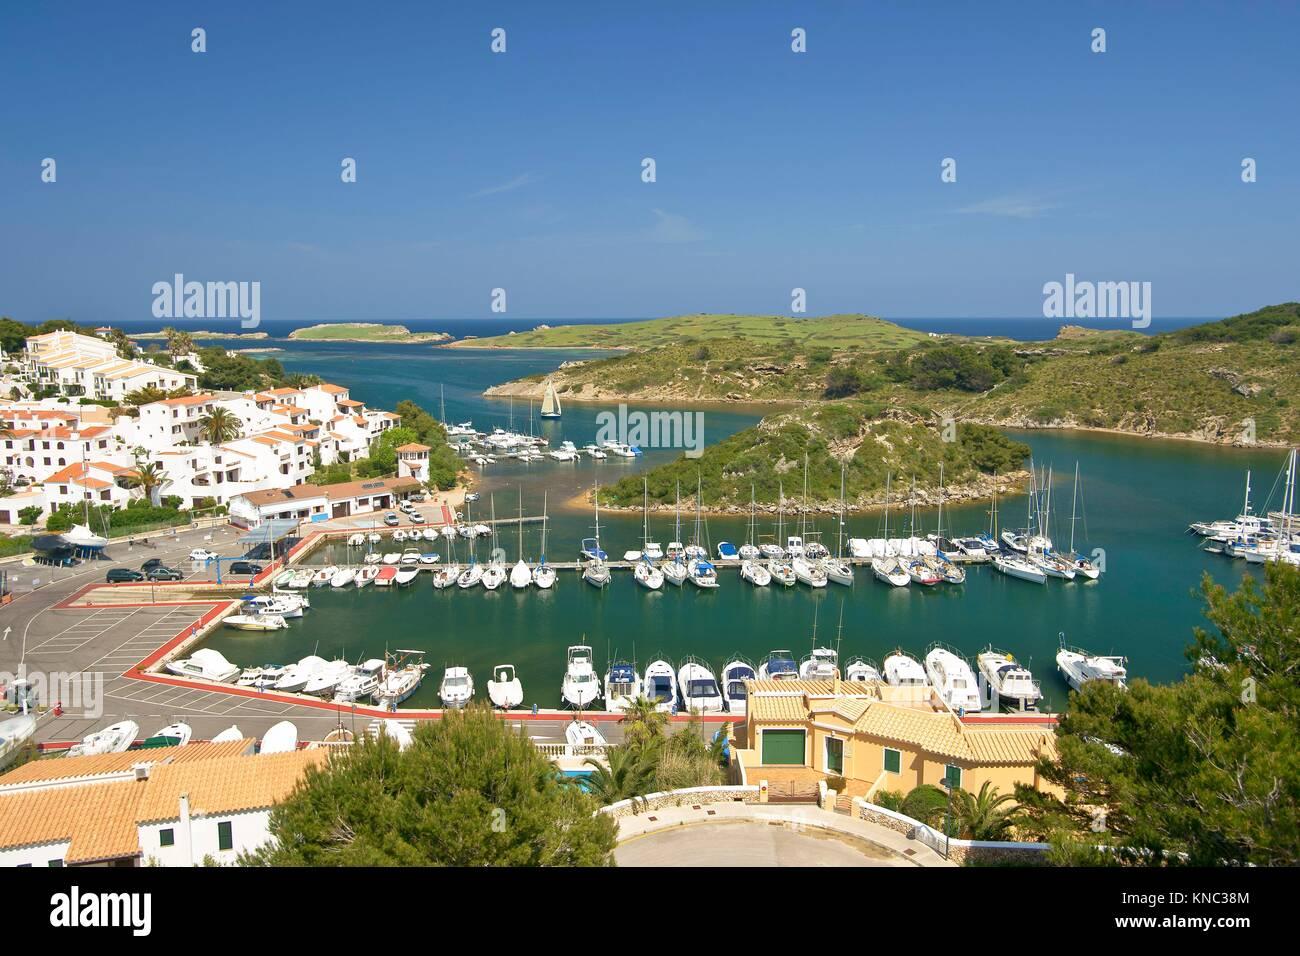 Puerto de Addaia. Minorca, Biosphere Reserve, Balearic Islands, Spain - Stock Image